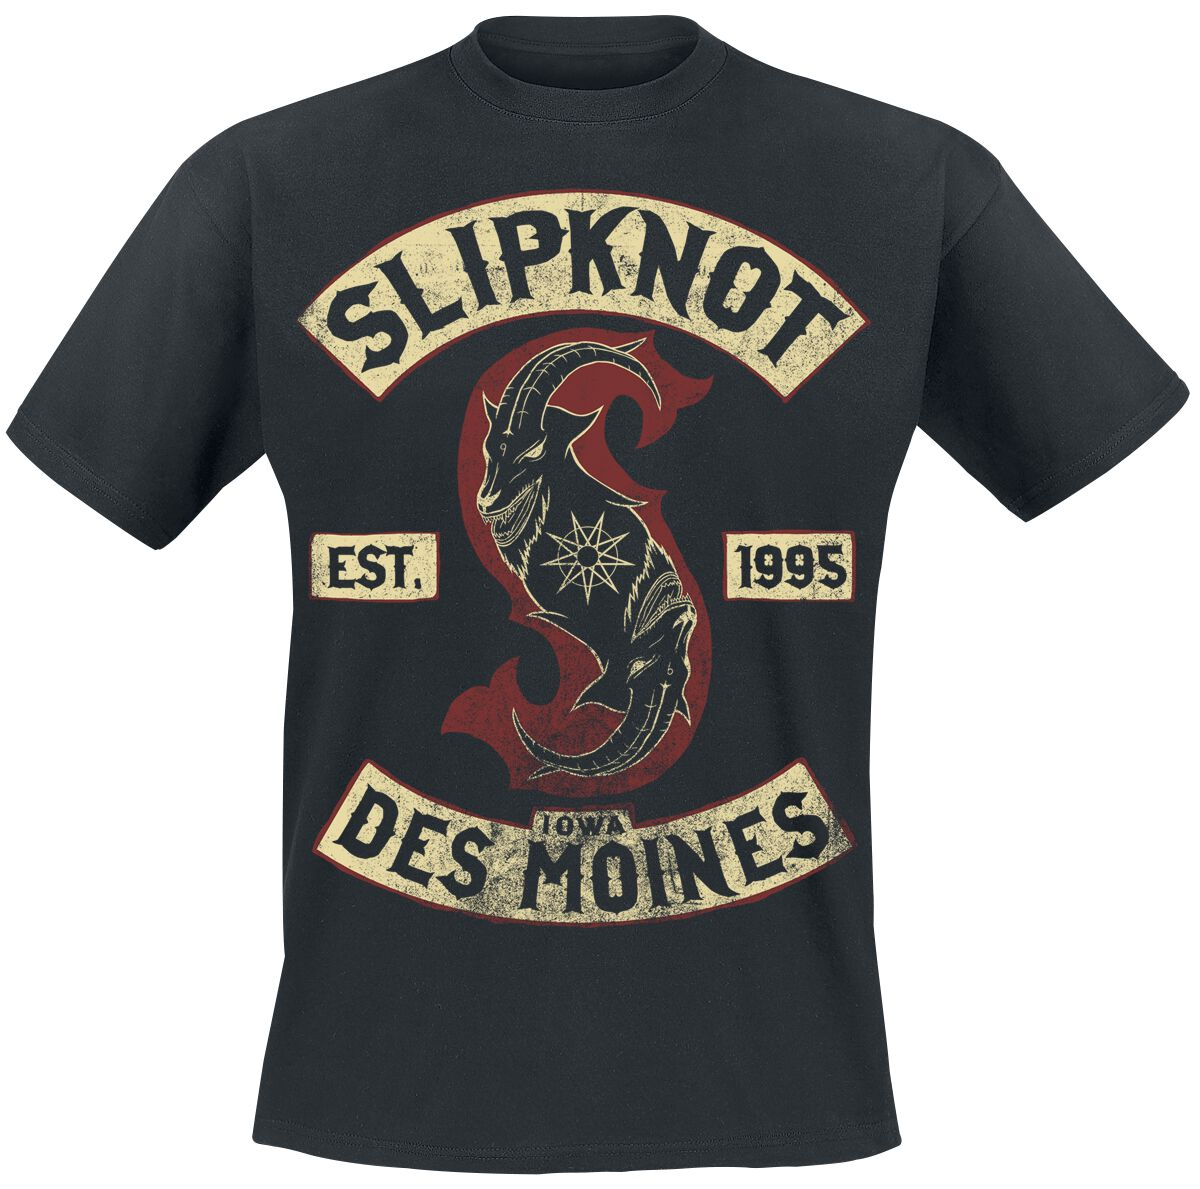 Image of   Slipknot Iowa Des Moines T-Shirt sort